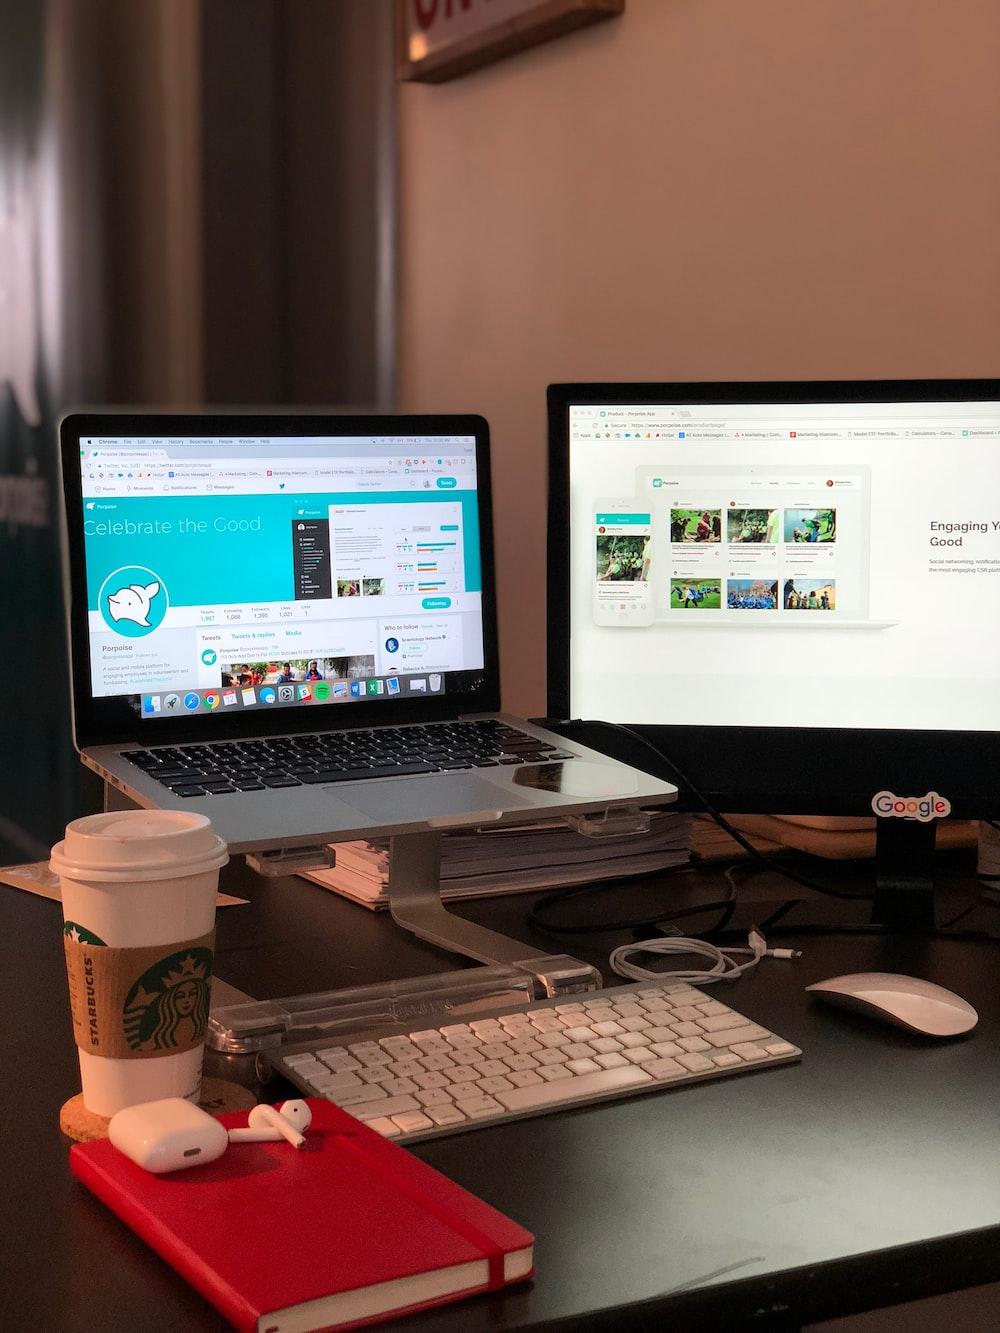 turned on MacBook Pro near Starbucks cup social media